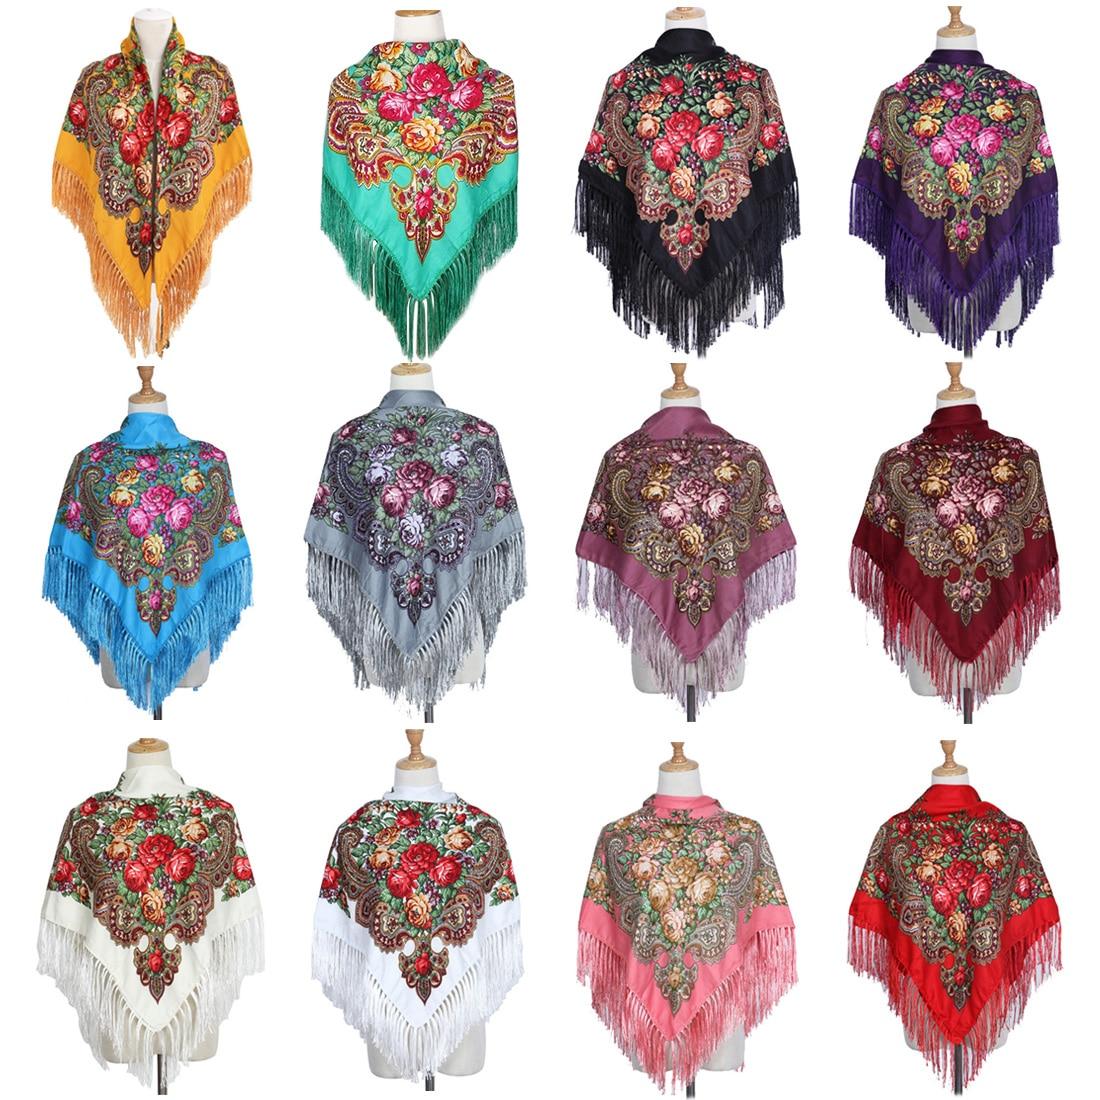 National Style Square Fashion Decorative Scarf Women Handmade Tassel Flower Design Scarves Blanket Shawl Handkerchief